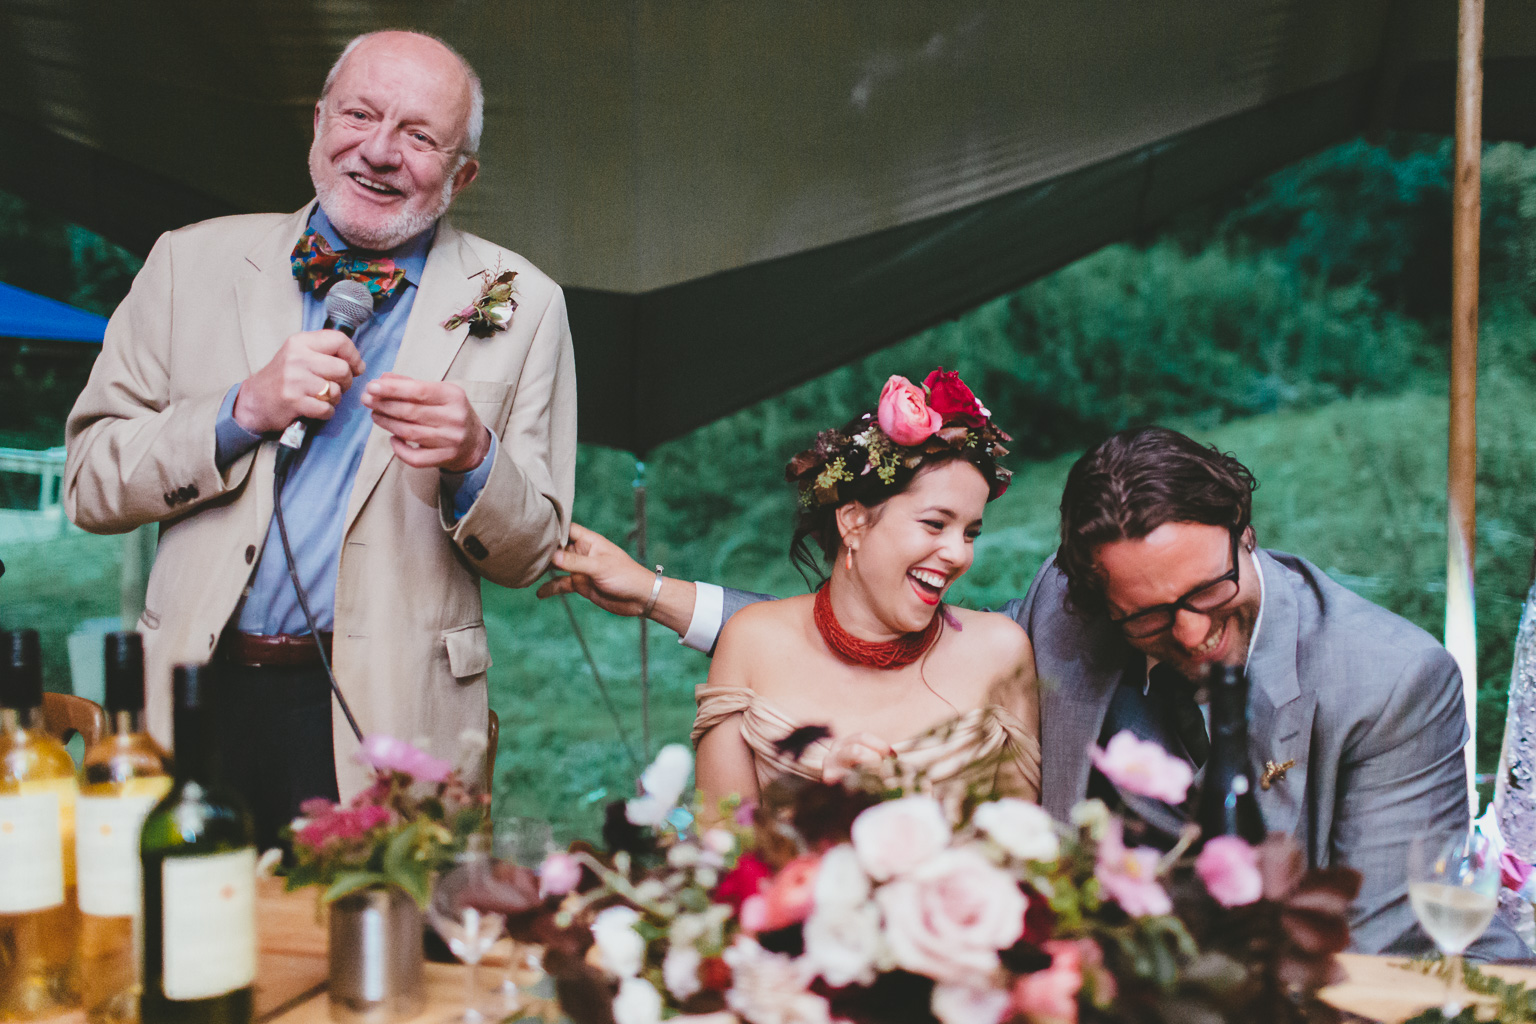 Festival-wedding-photography-00014